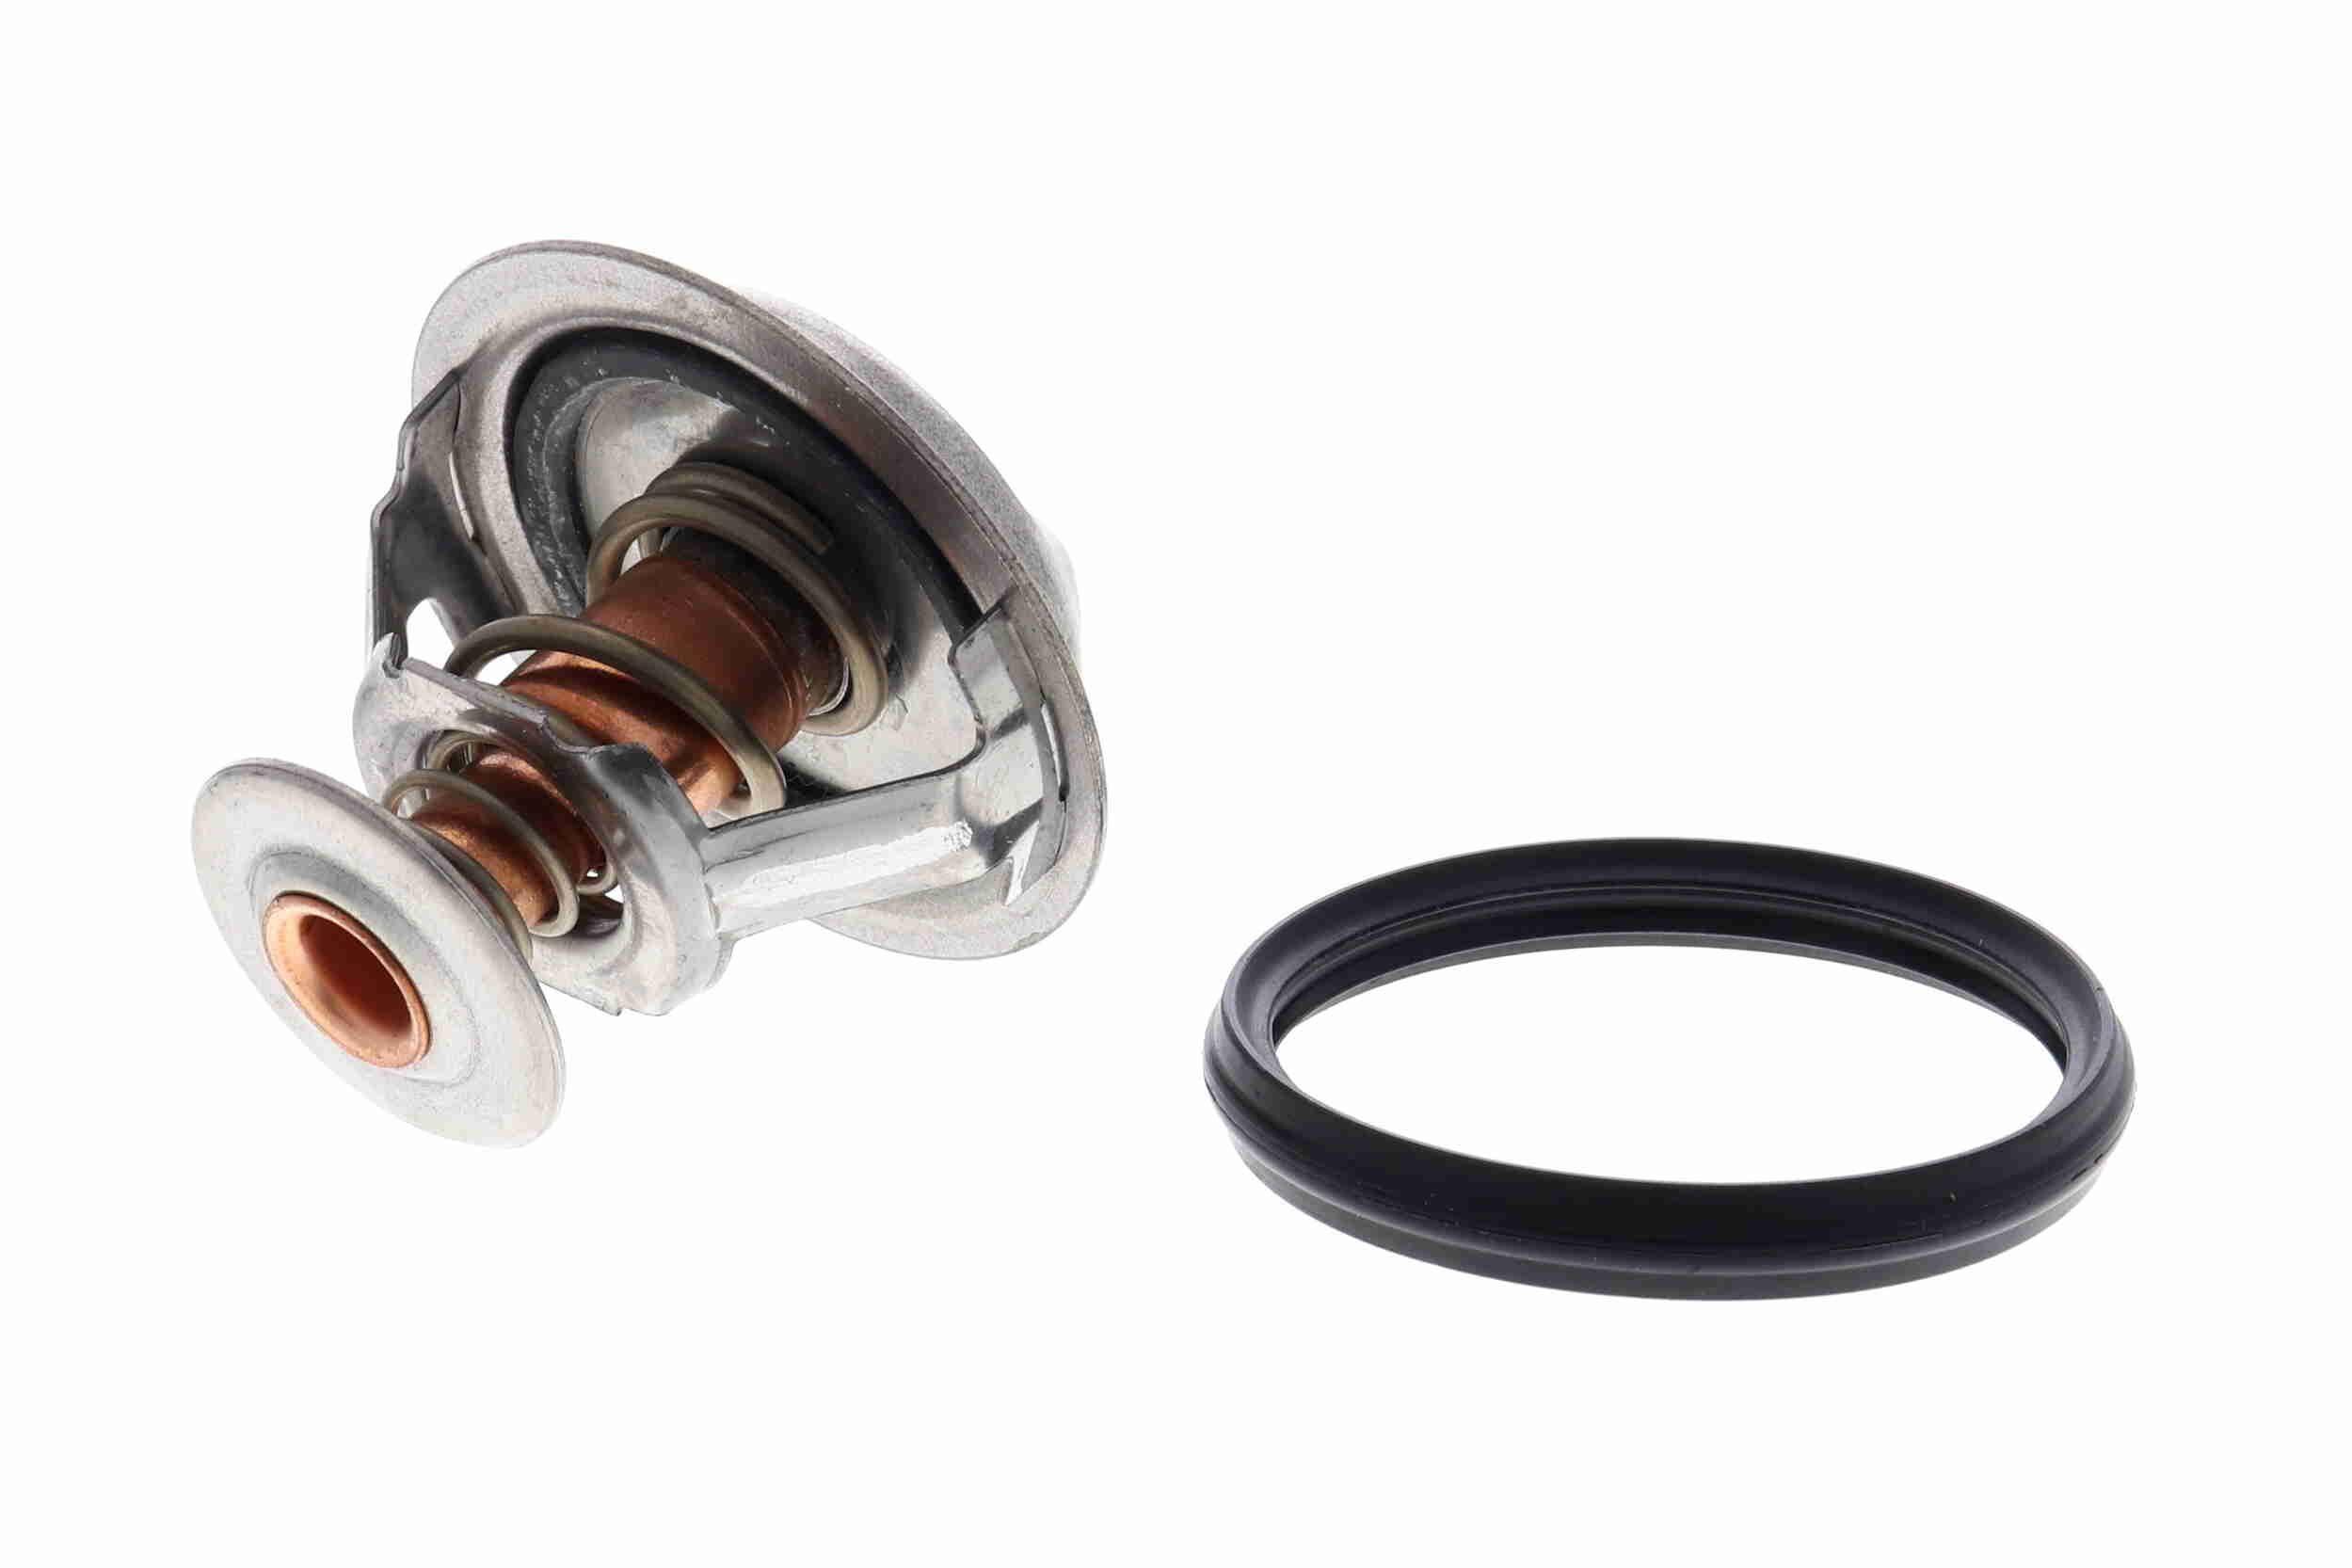 Kühlwasserthermostat V15-99-2098 VEMO V15-99-2098 in Original Qualität